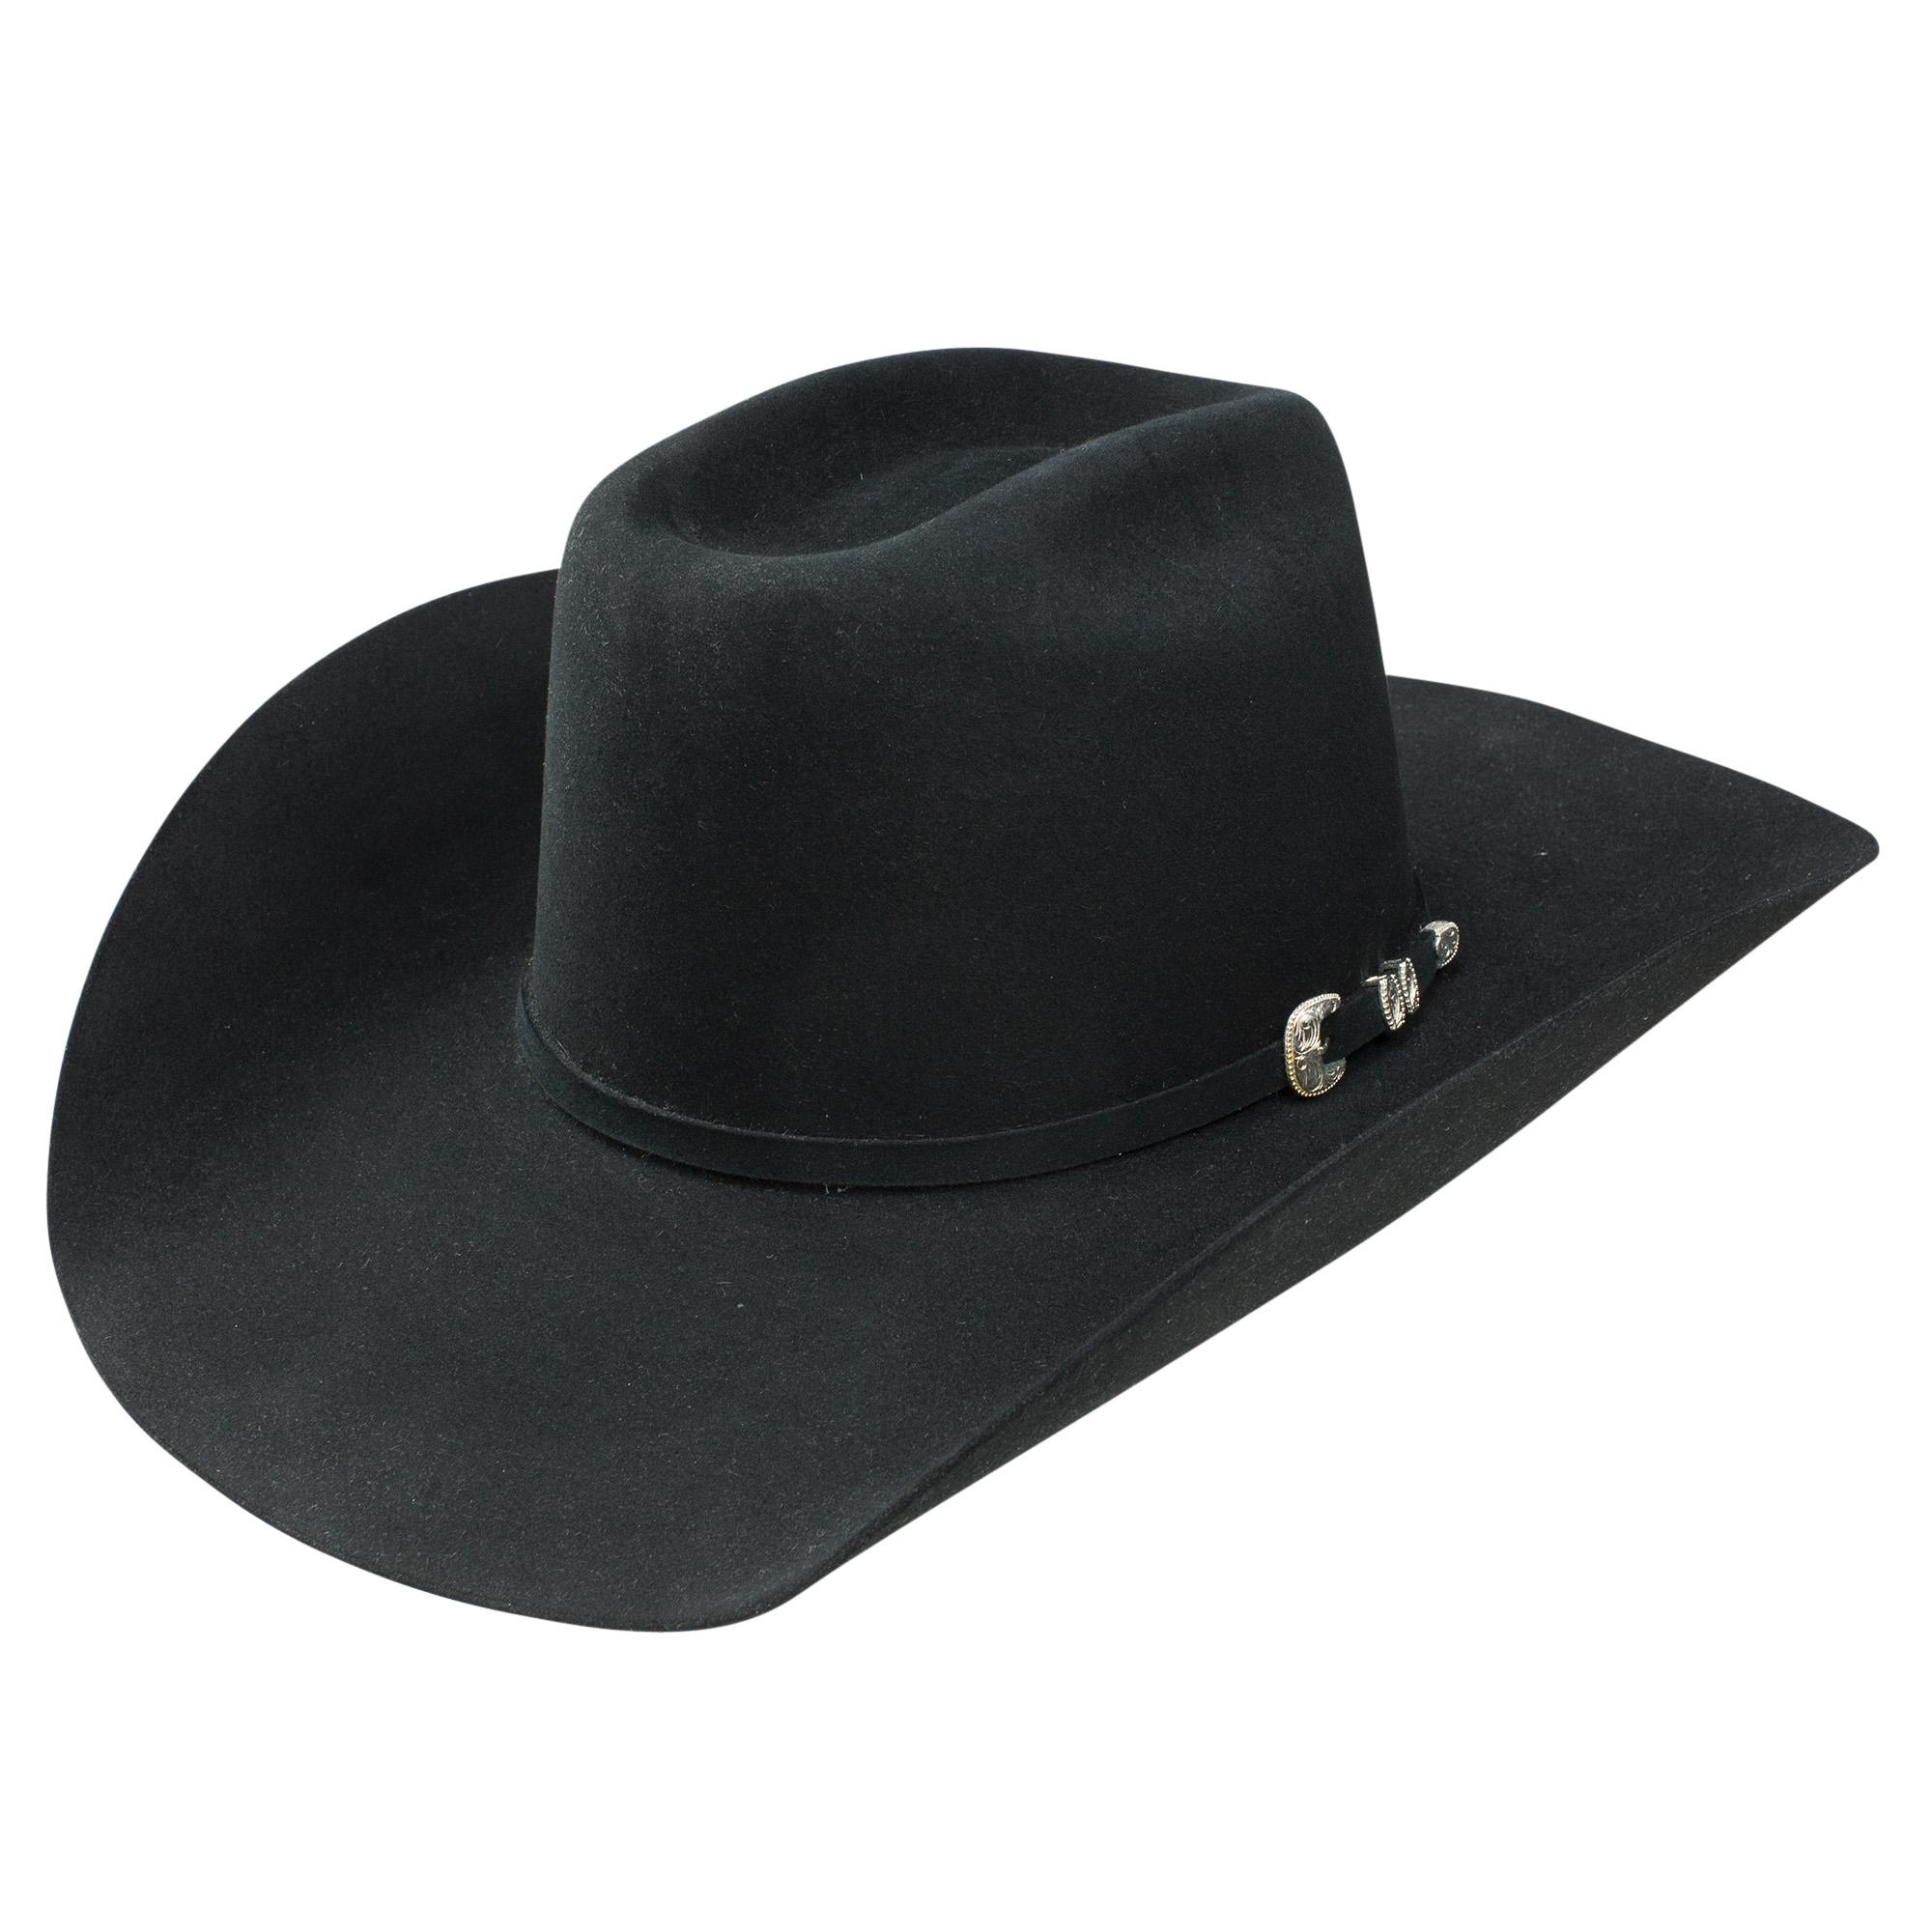 Resistol Cody Johnson Mold Breaker - (15X) Fur Cowboy Hat